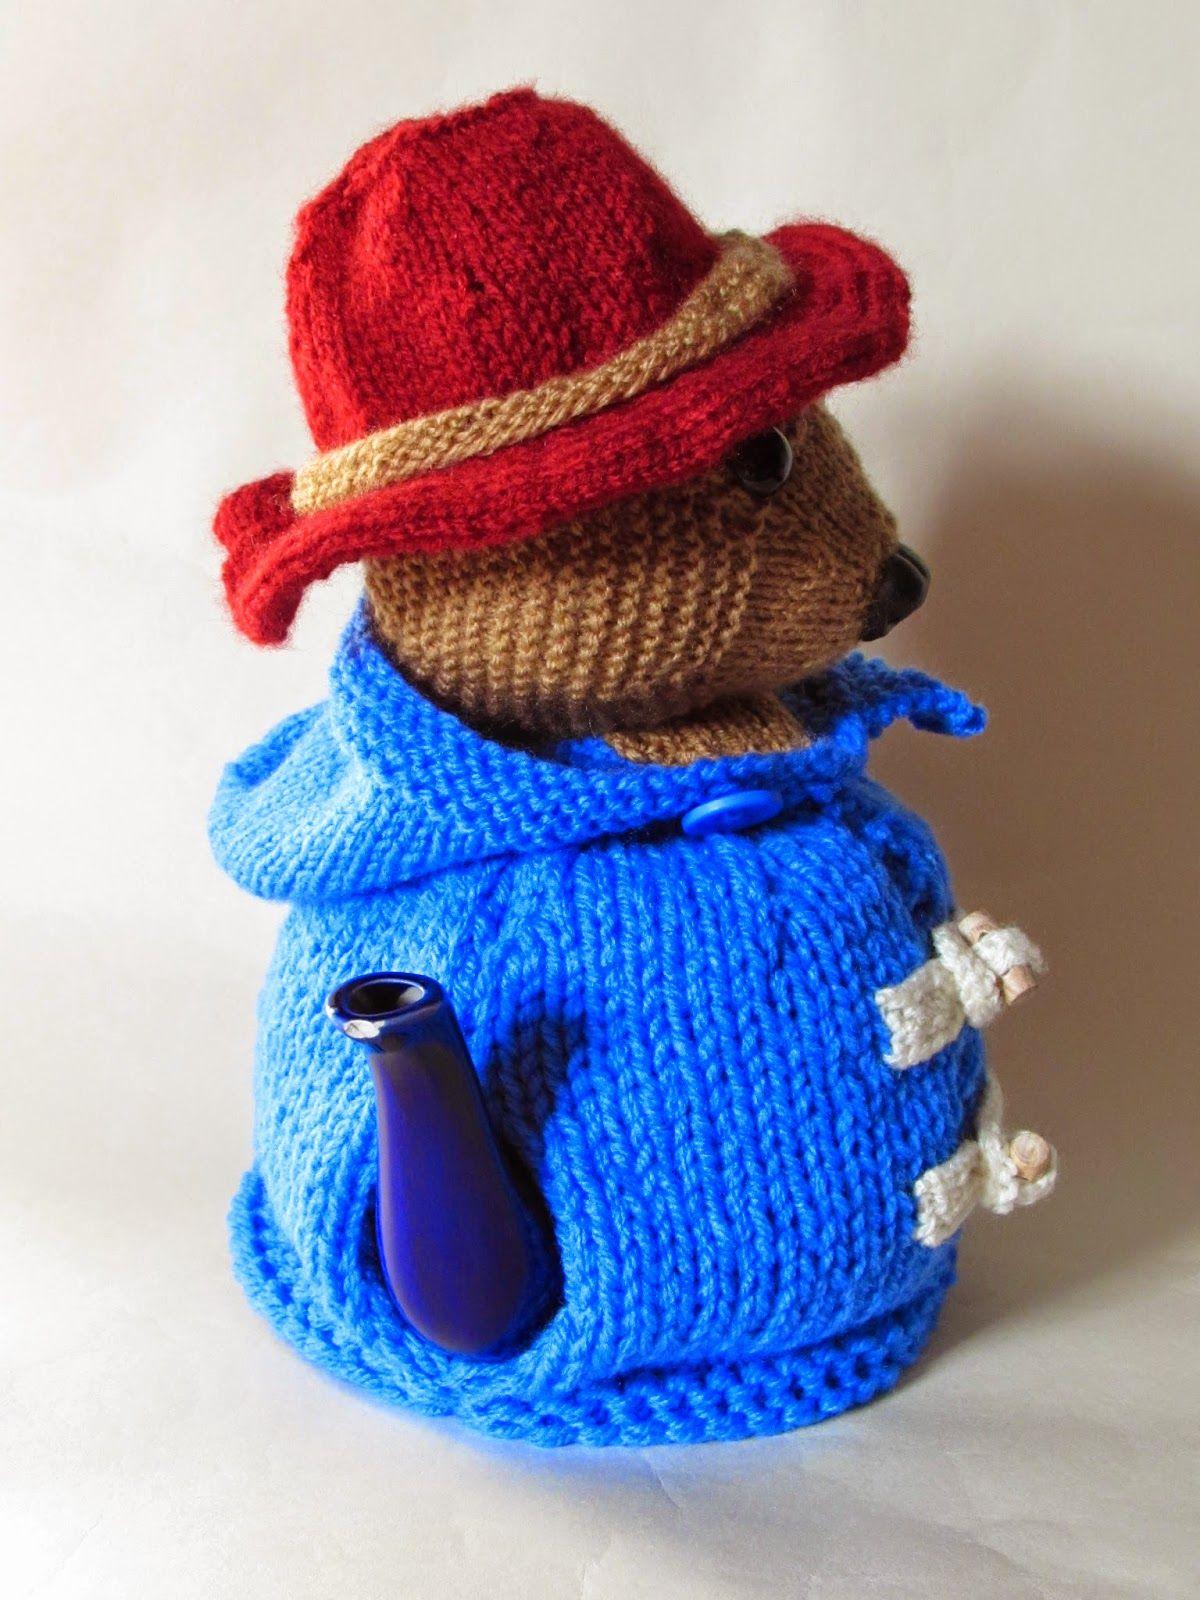 Paddington bear tea cosy sideg 12001600 pixels tea cosies paddington bear tea cosy sideg 12001600 pixels tea cosy knitting patterncrochet bankloansurffo Choice Image